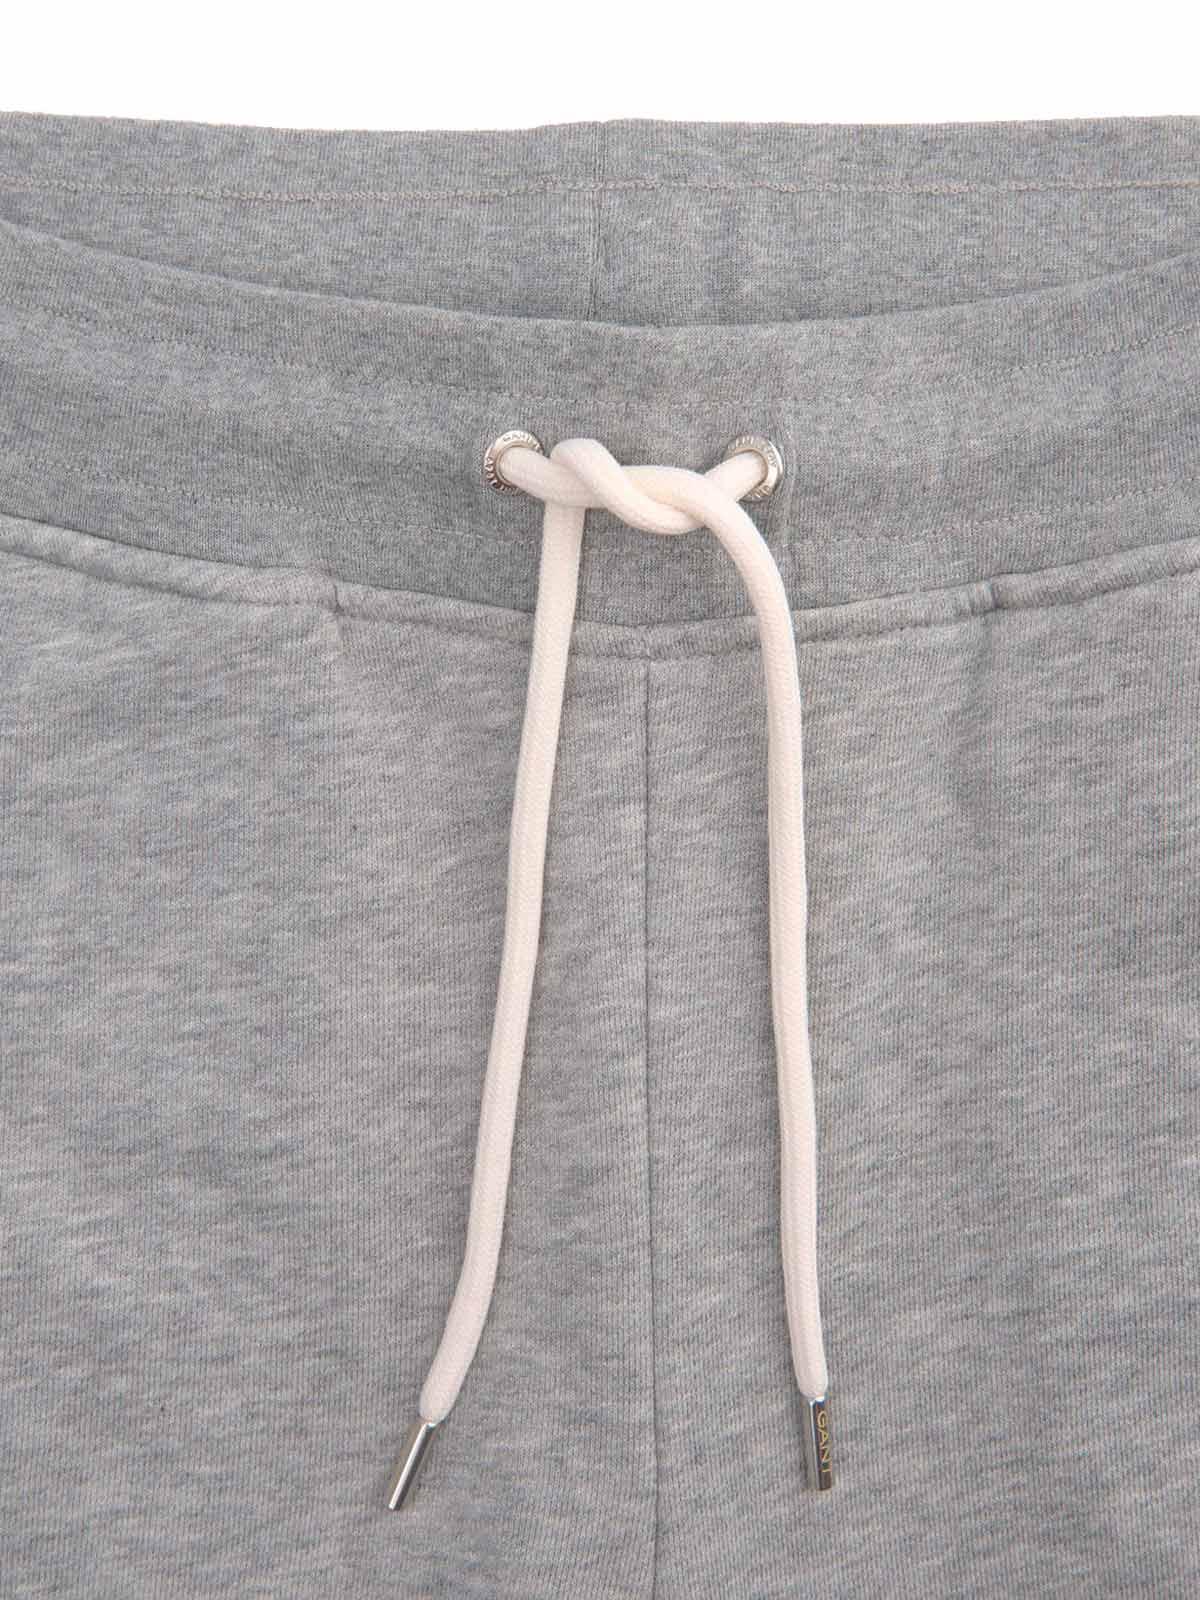 Picture of GANT | Women's Sweat Pants